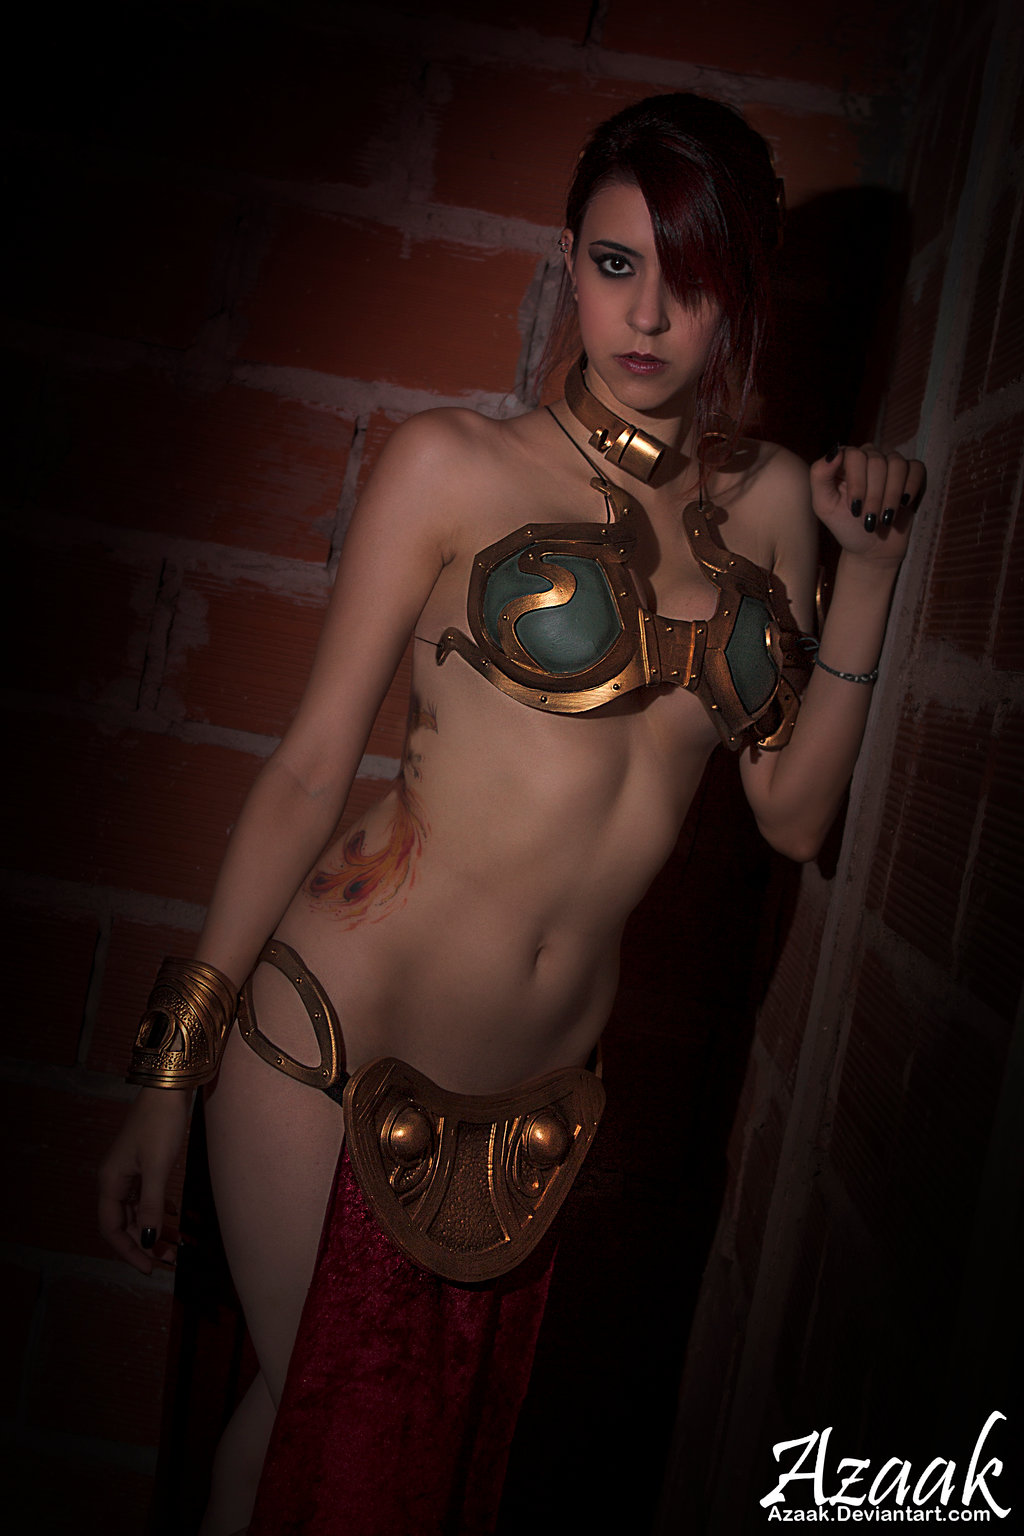 Slave_Leia-Marianne_Black-003.jpg